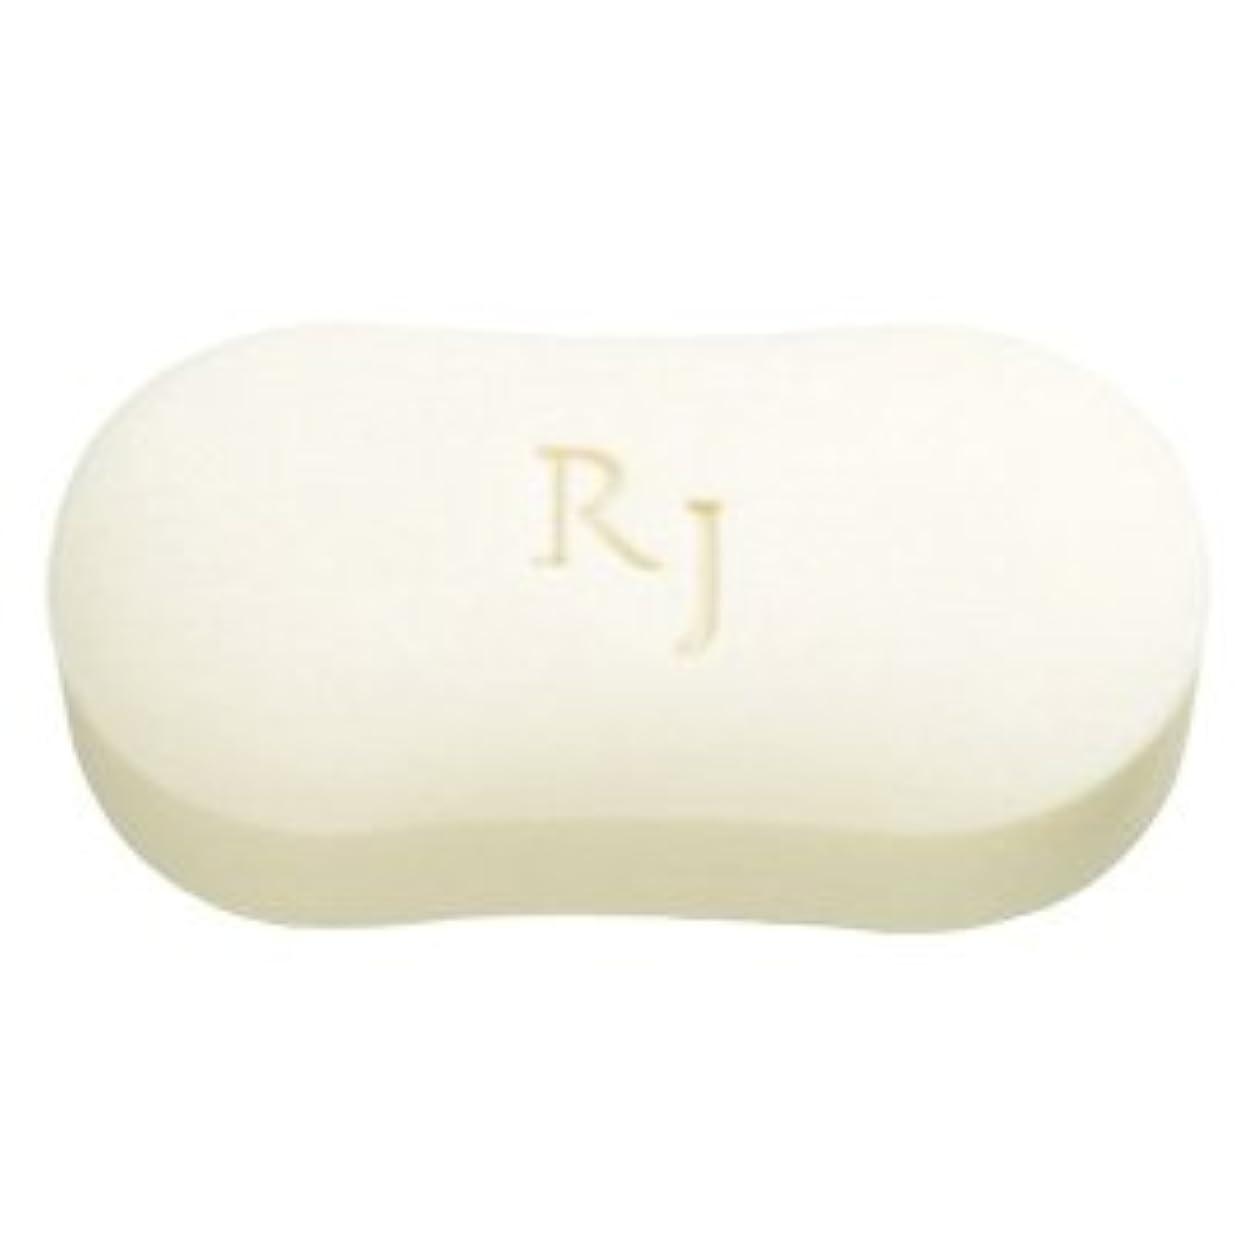 RJホワイトソープ(洗顔石鹸?ボディソープ) 脂性肌用 120g/Royal Jelly White Soap<120g>